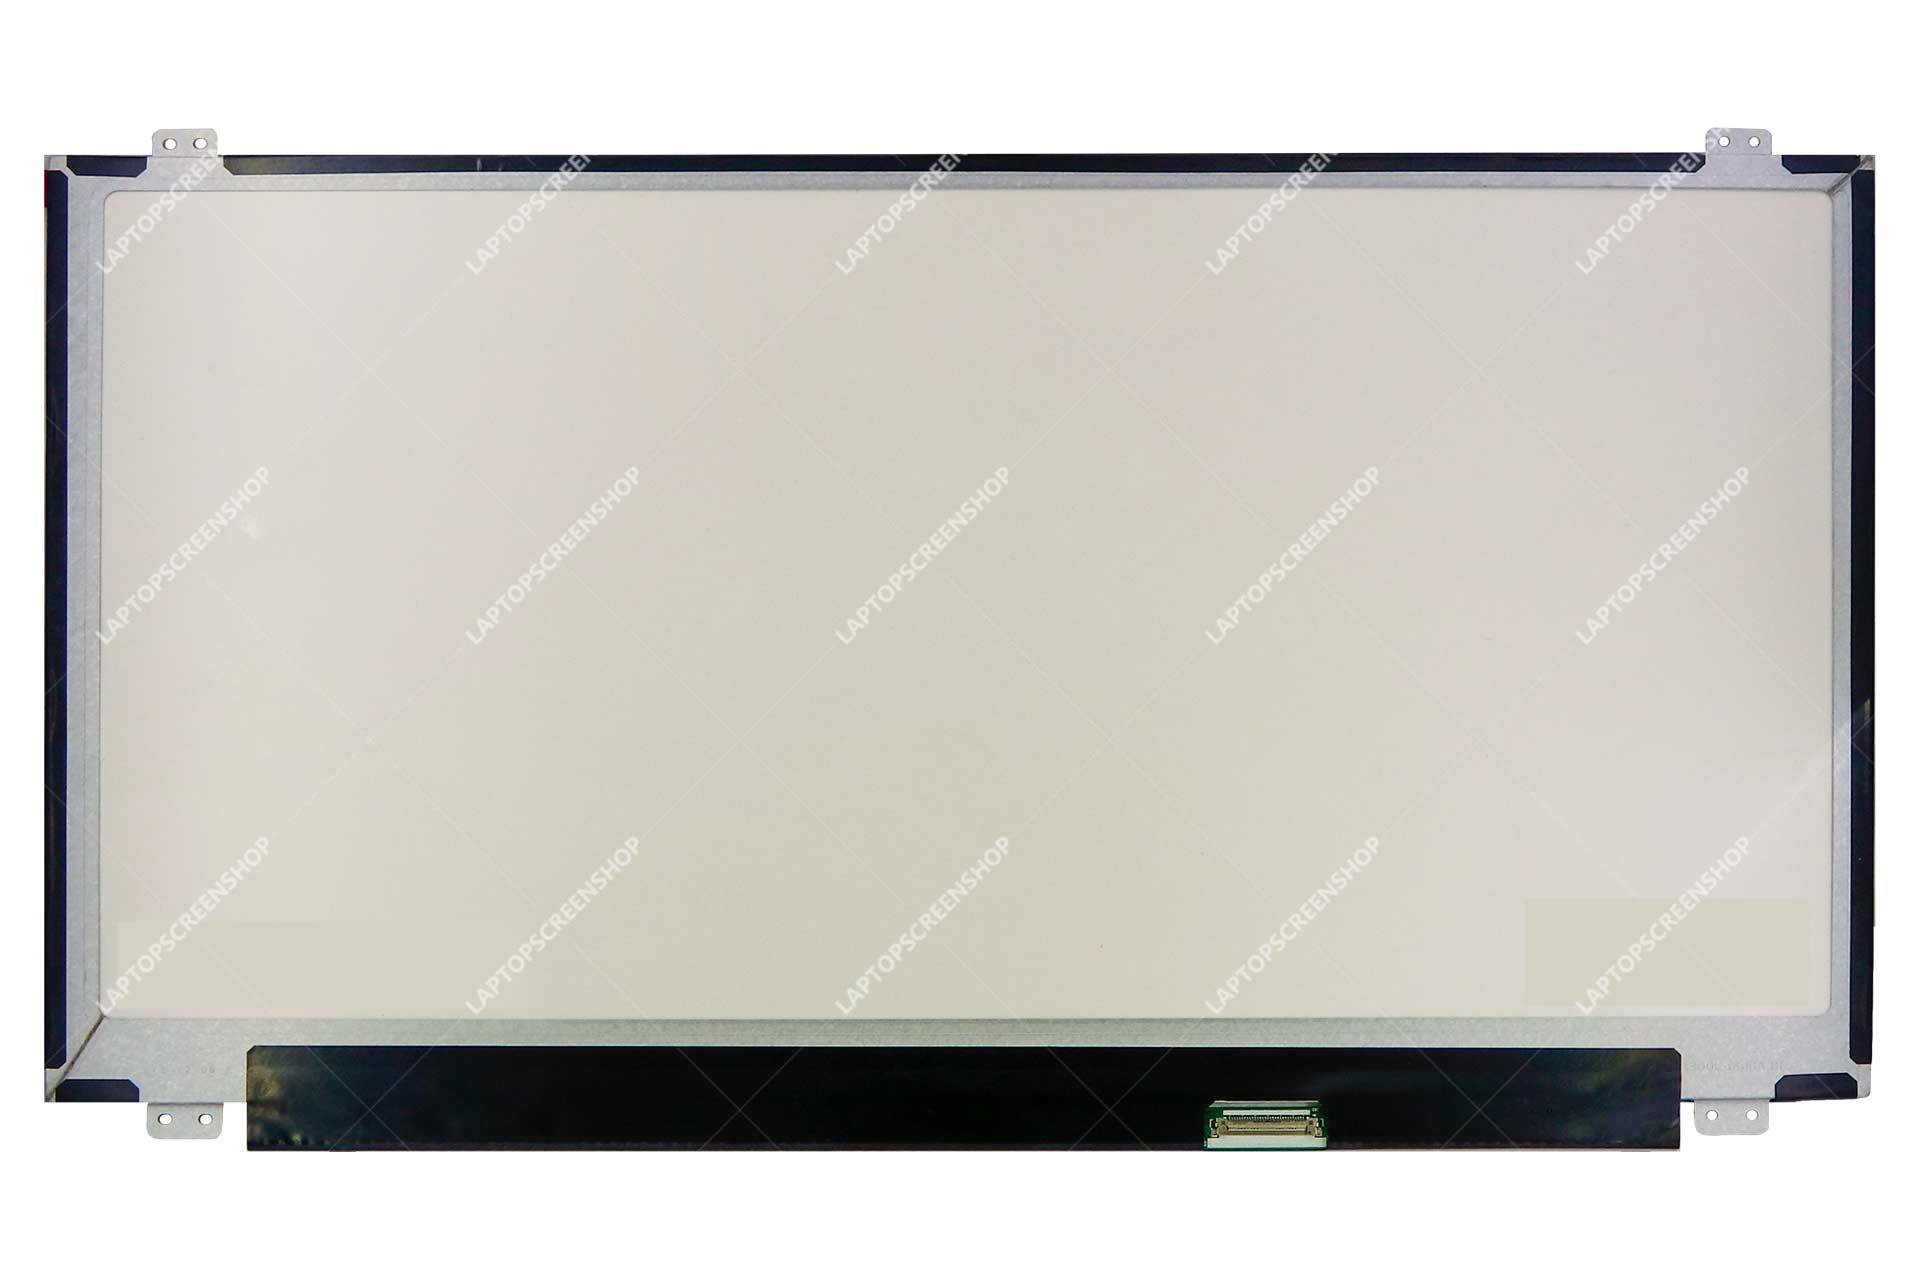 ACER-ASPIRE-E1-522-5824-LCD  HD فروشگاه لپ تاپ اسکرين   تعمير لپ تاپ